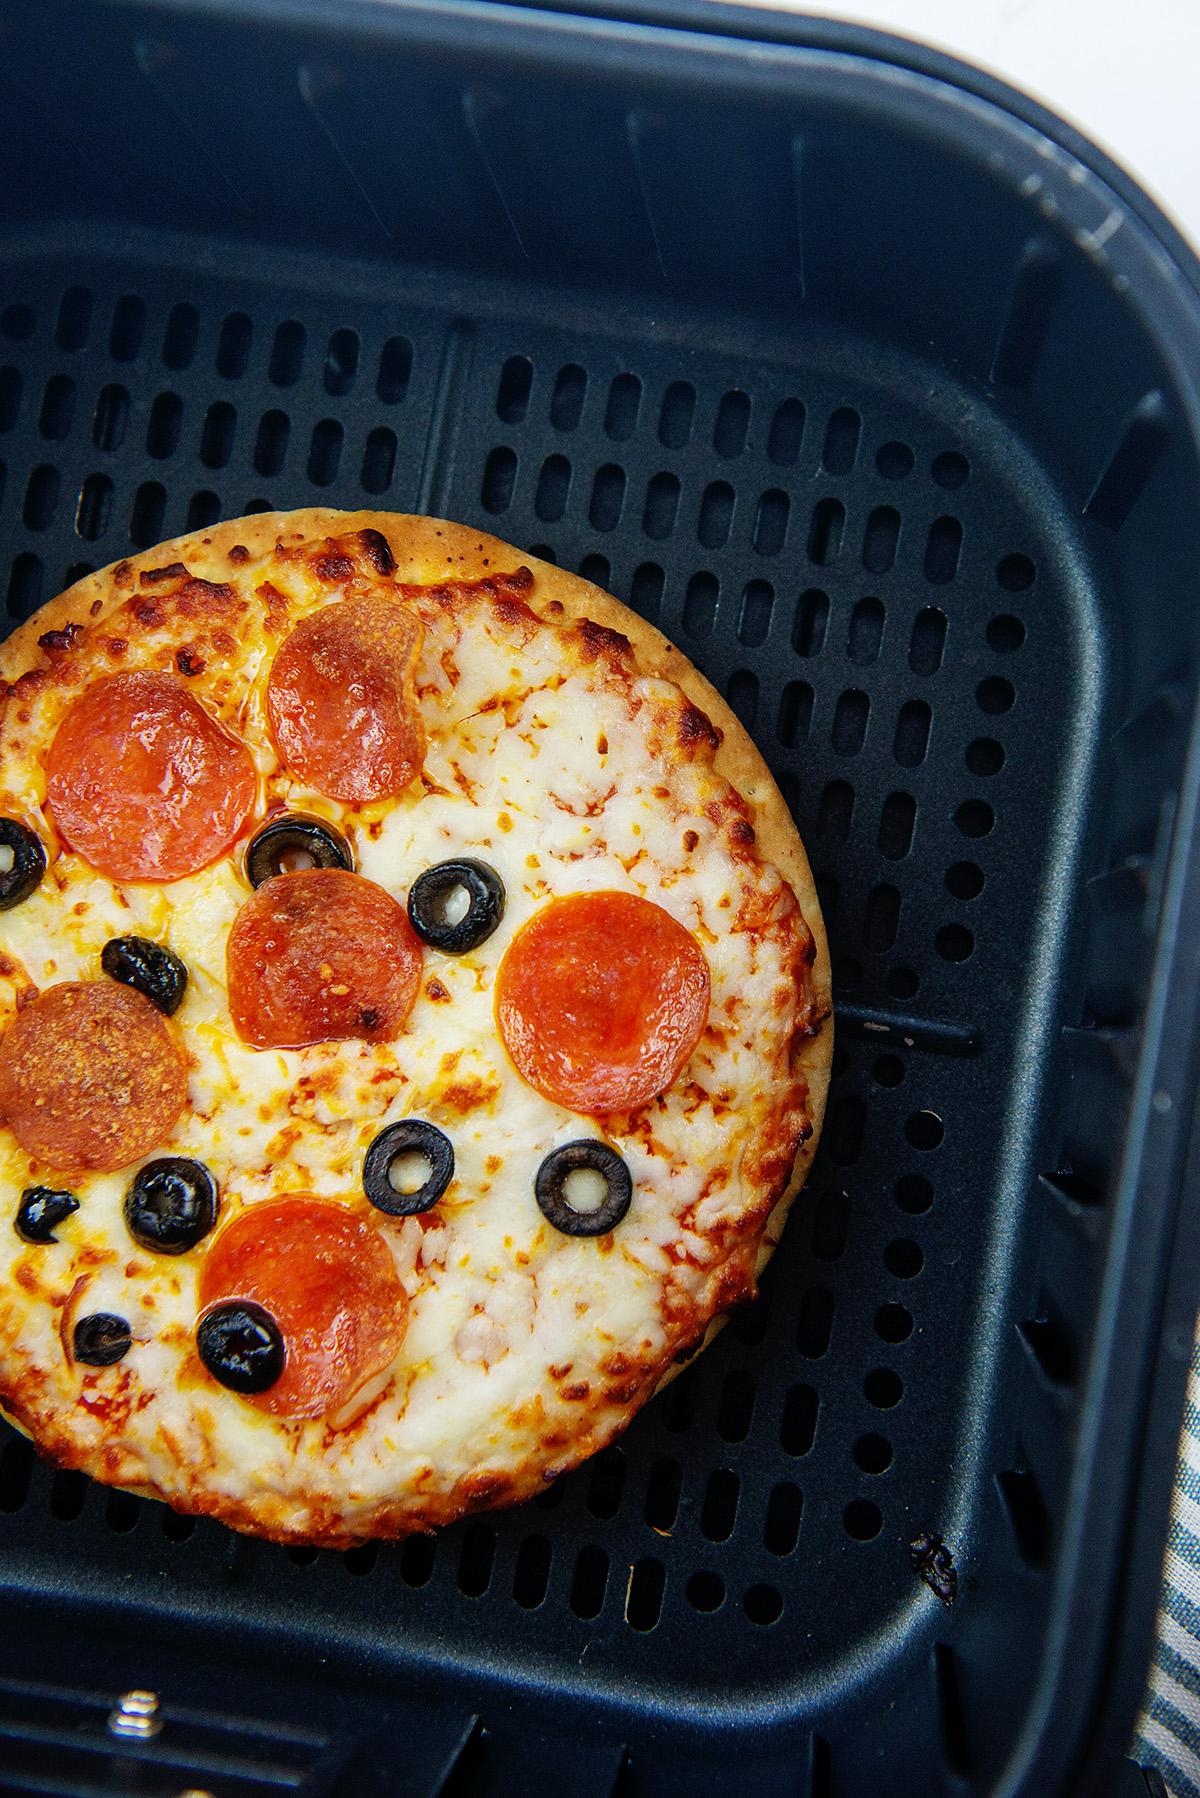 Frozen pizza in an air fryer basket